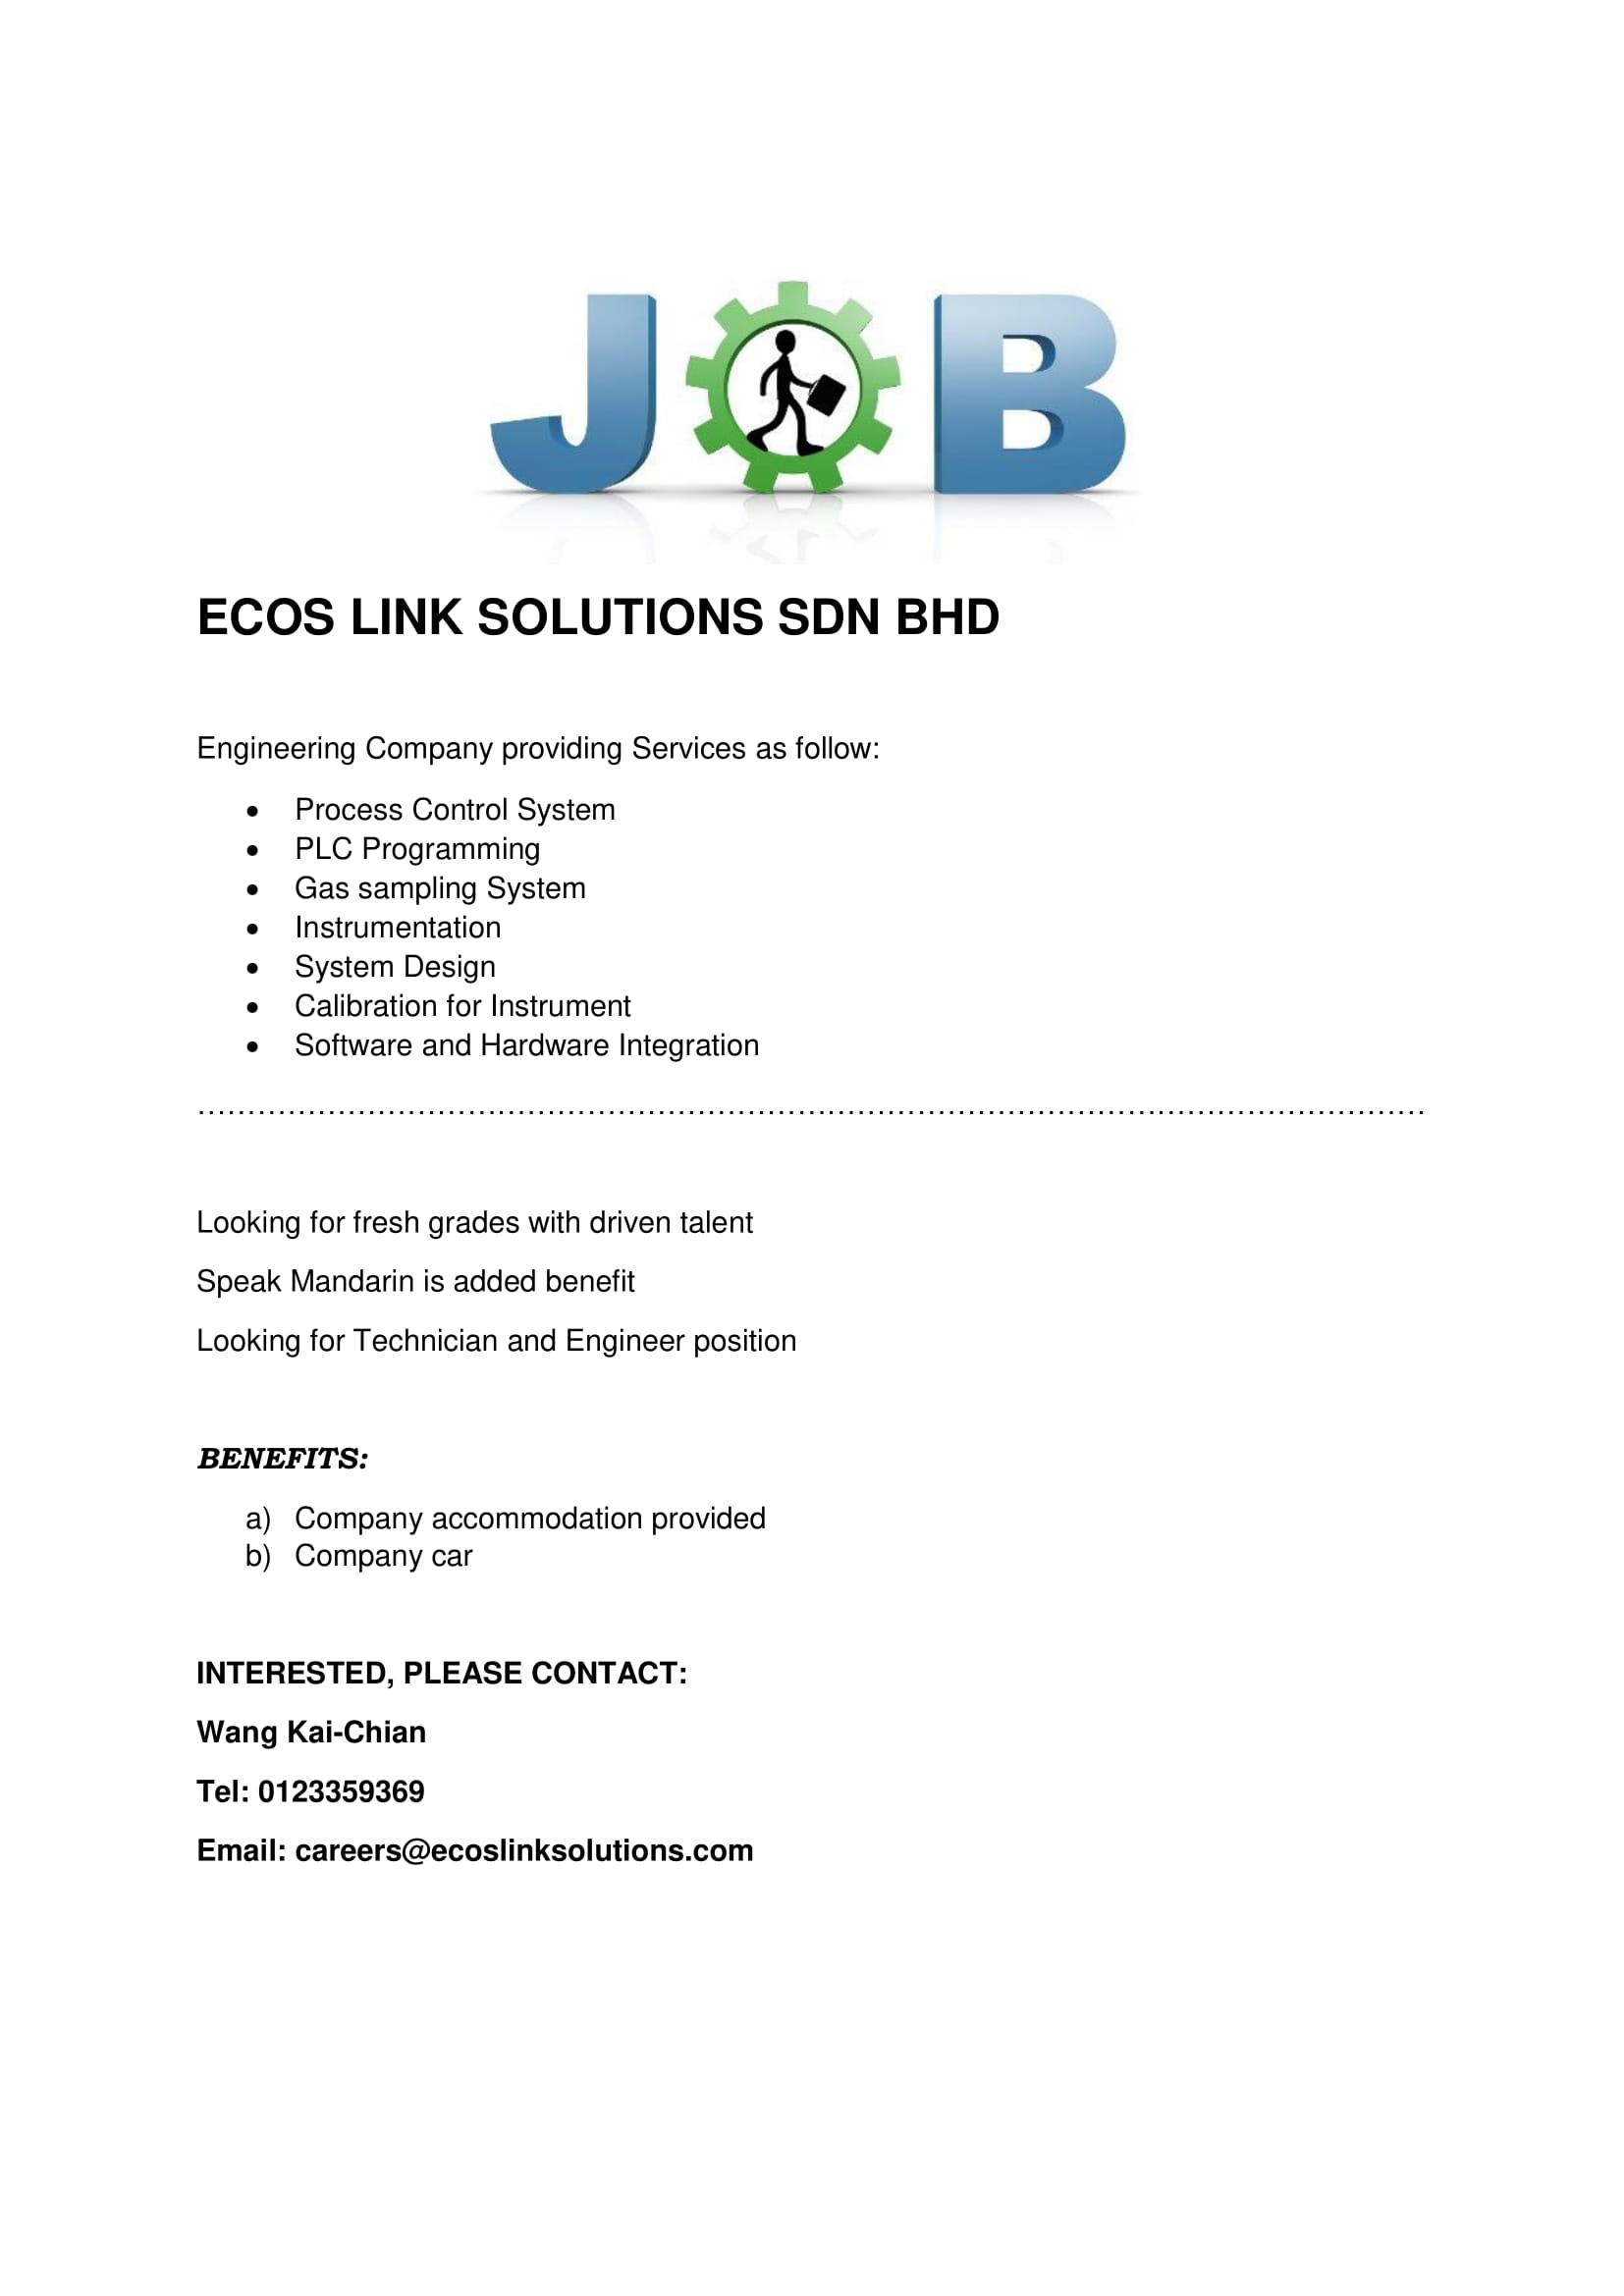 ECOS LINK SOLUTIONS SDN BHD- Vtar-1